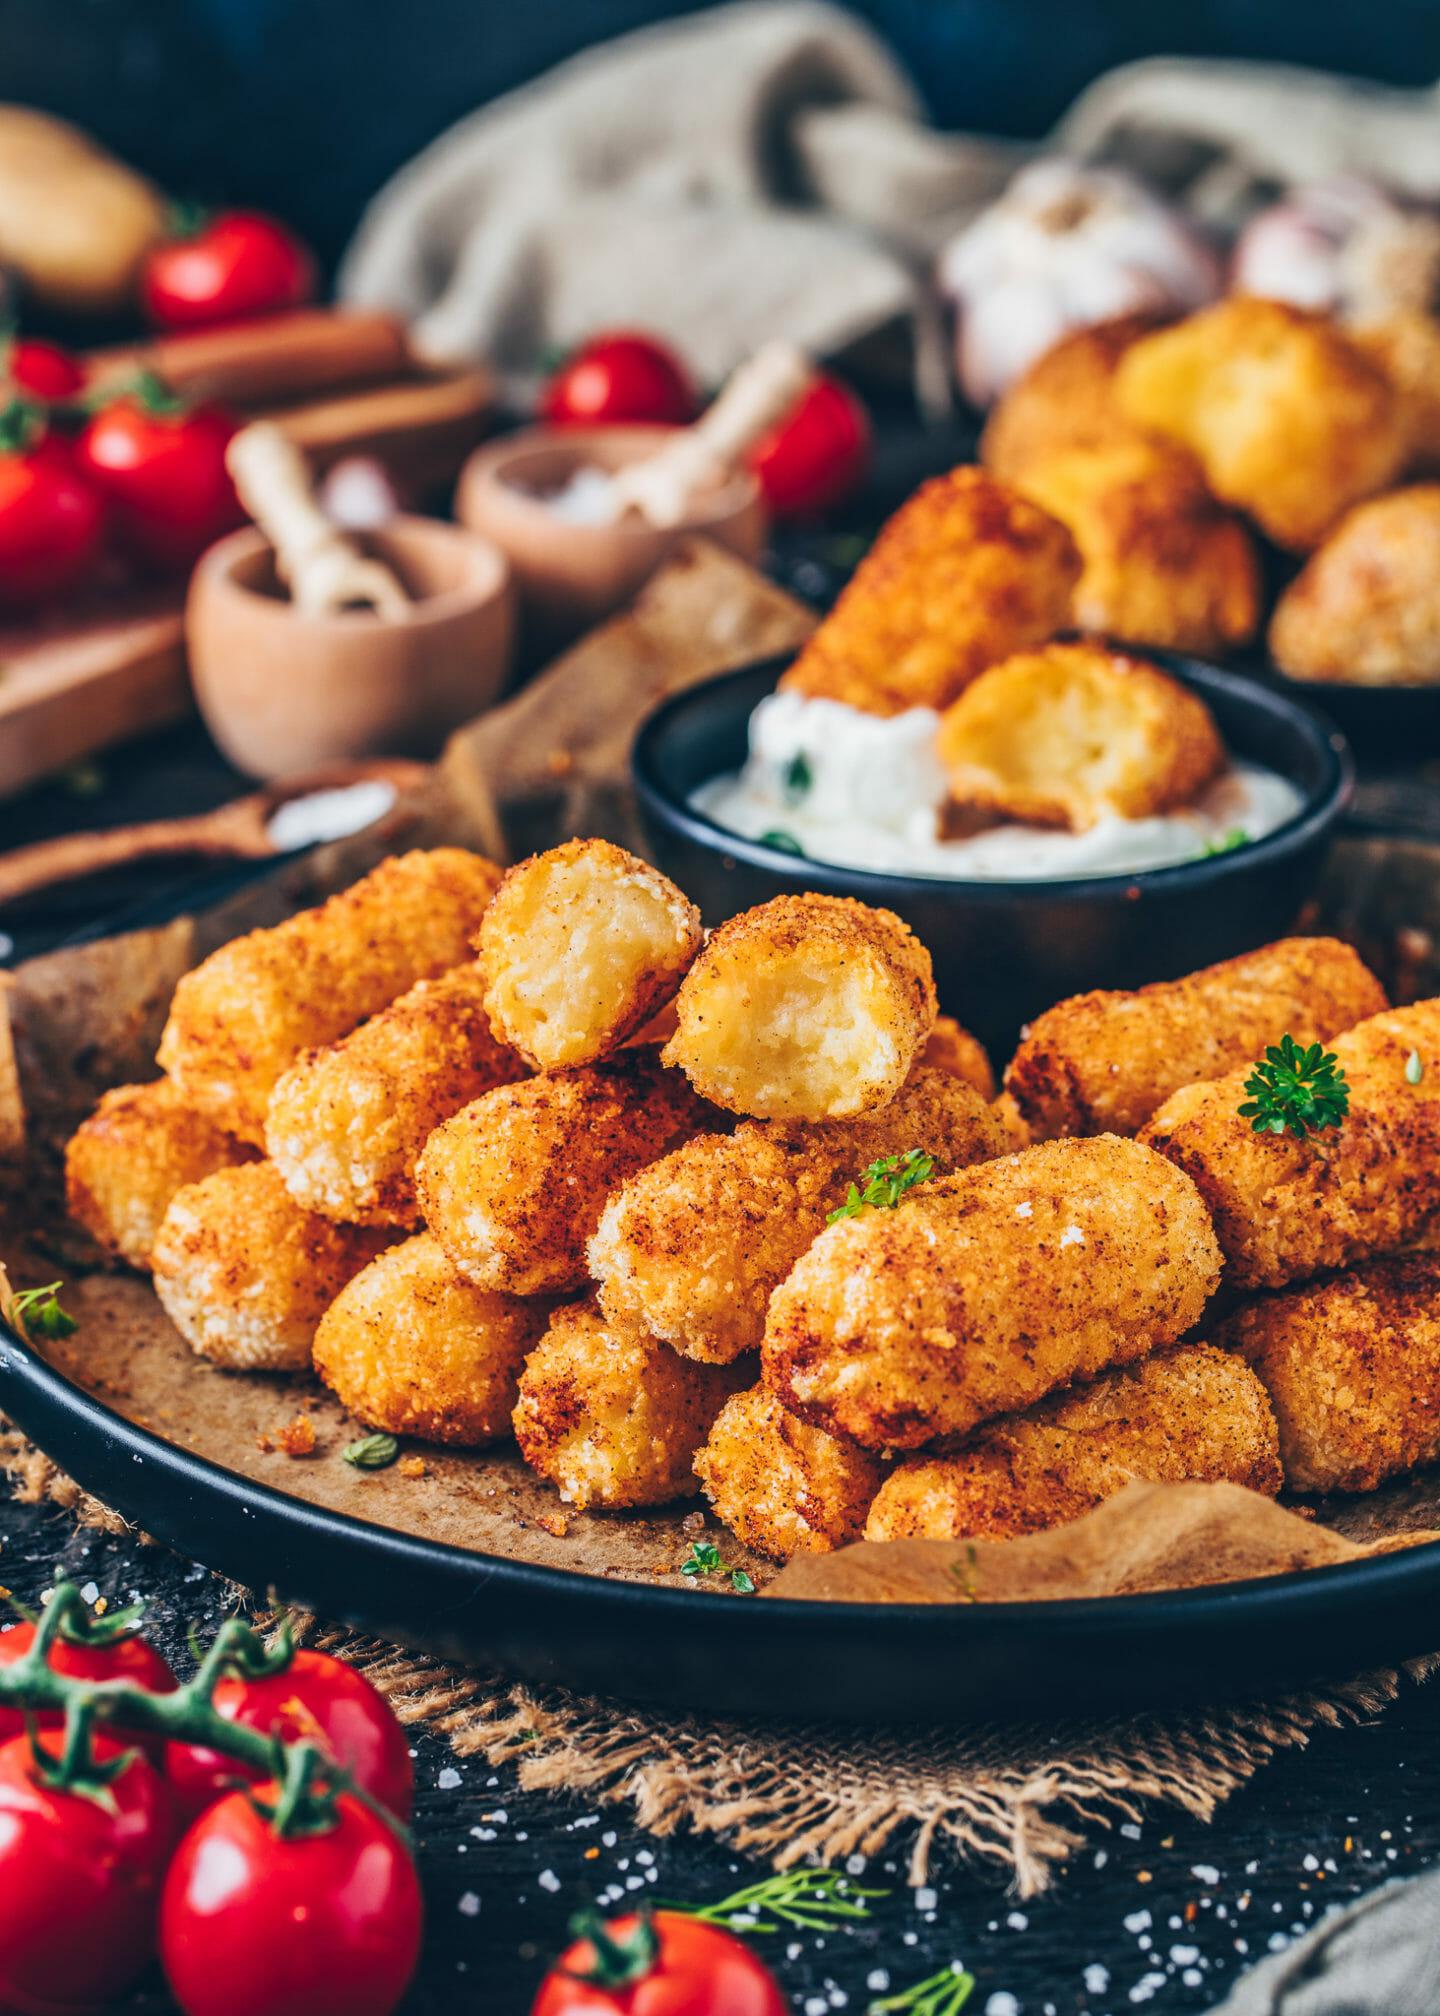 Vegan Potato Croquettes (Easy, Gluten-free Tater Tots)